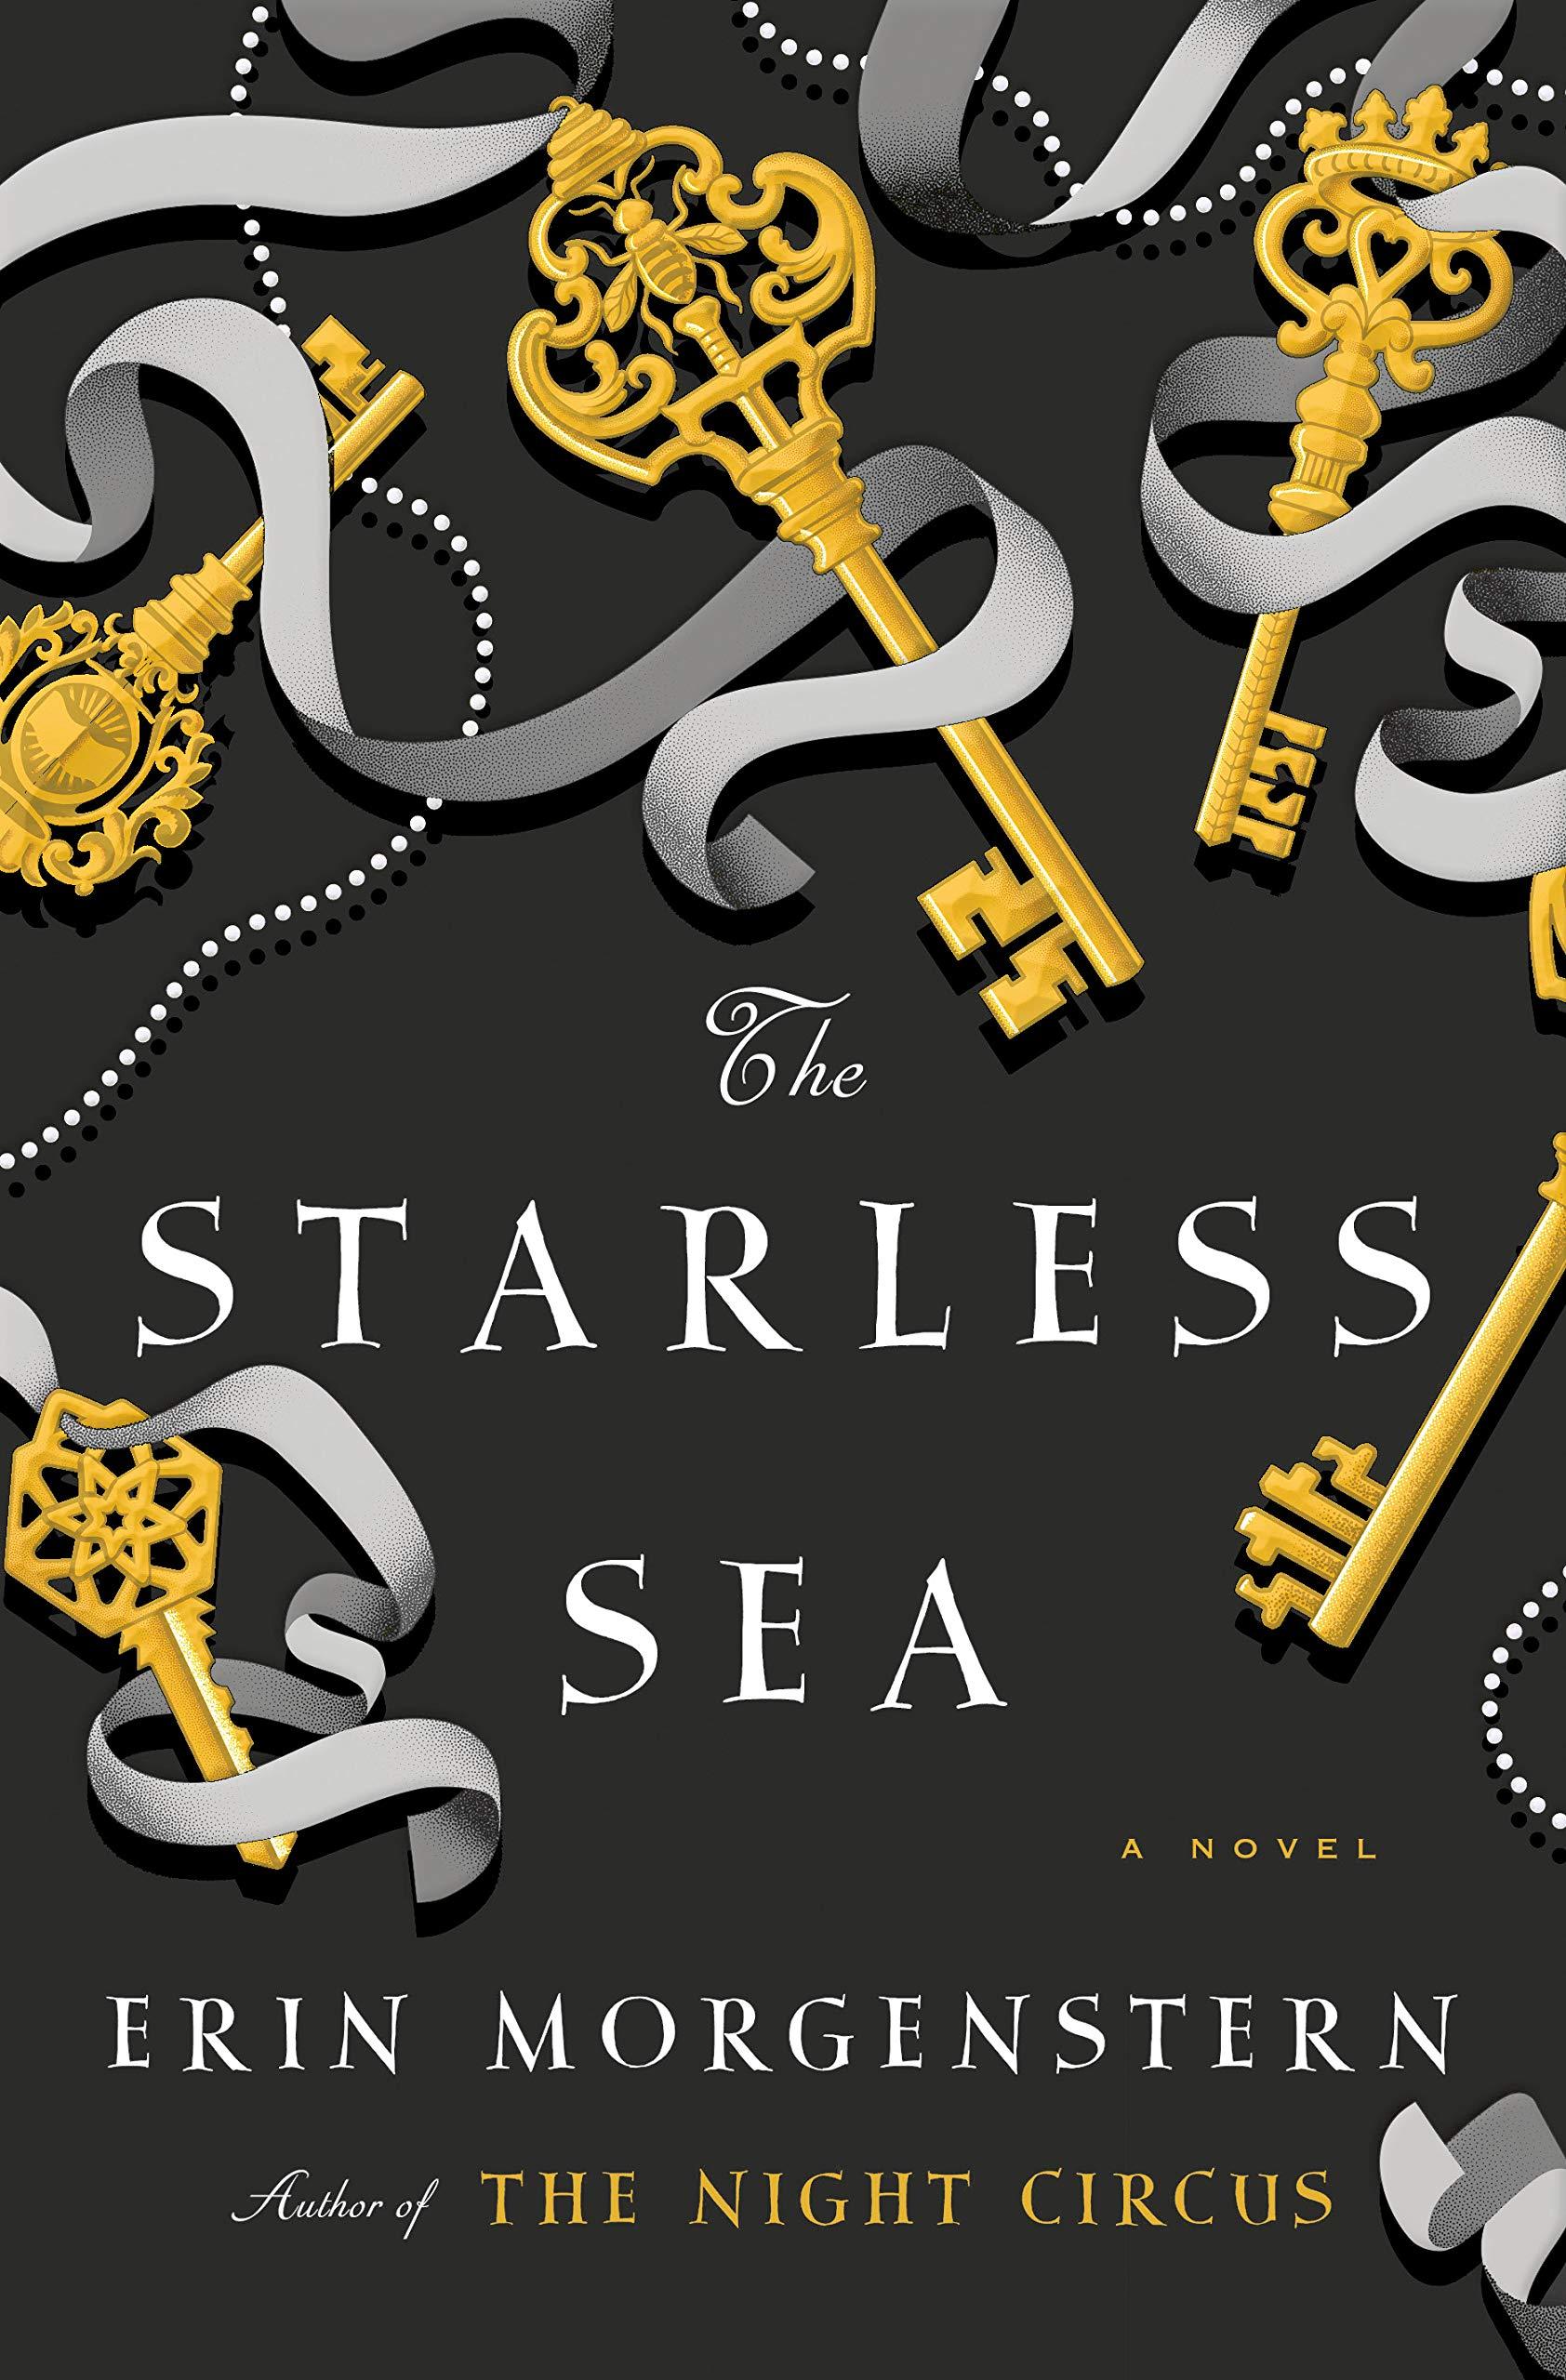 The Starless Sea Erin Morgenstern.jpg